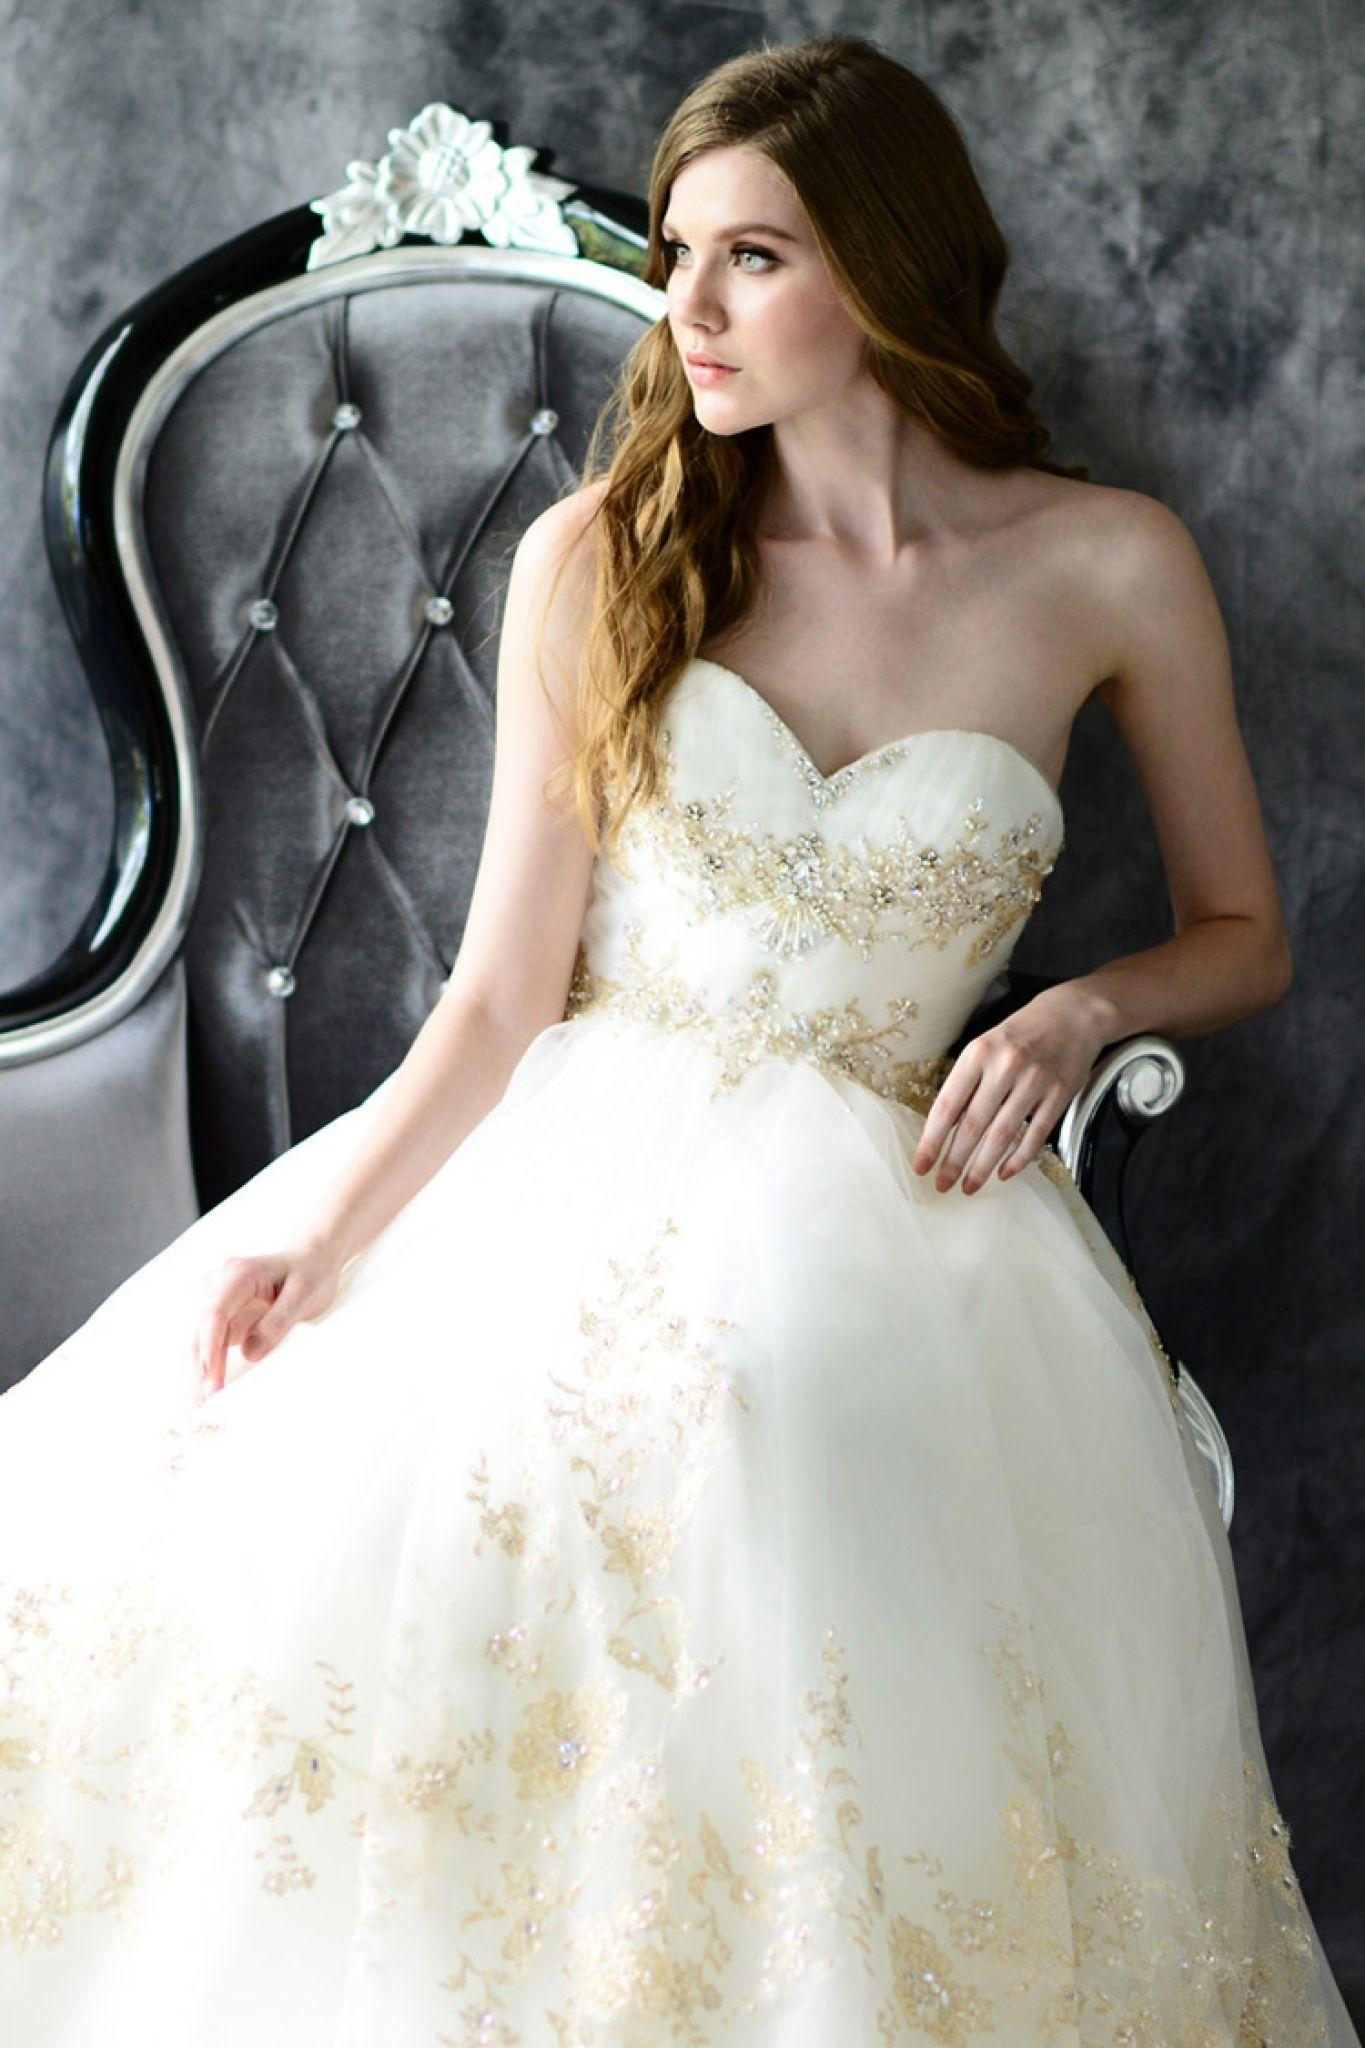 Mature bride wedding dresses  wedding dresses kansas city  wedding dresses for the mature bride